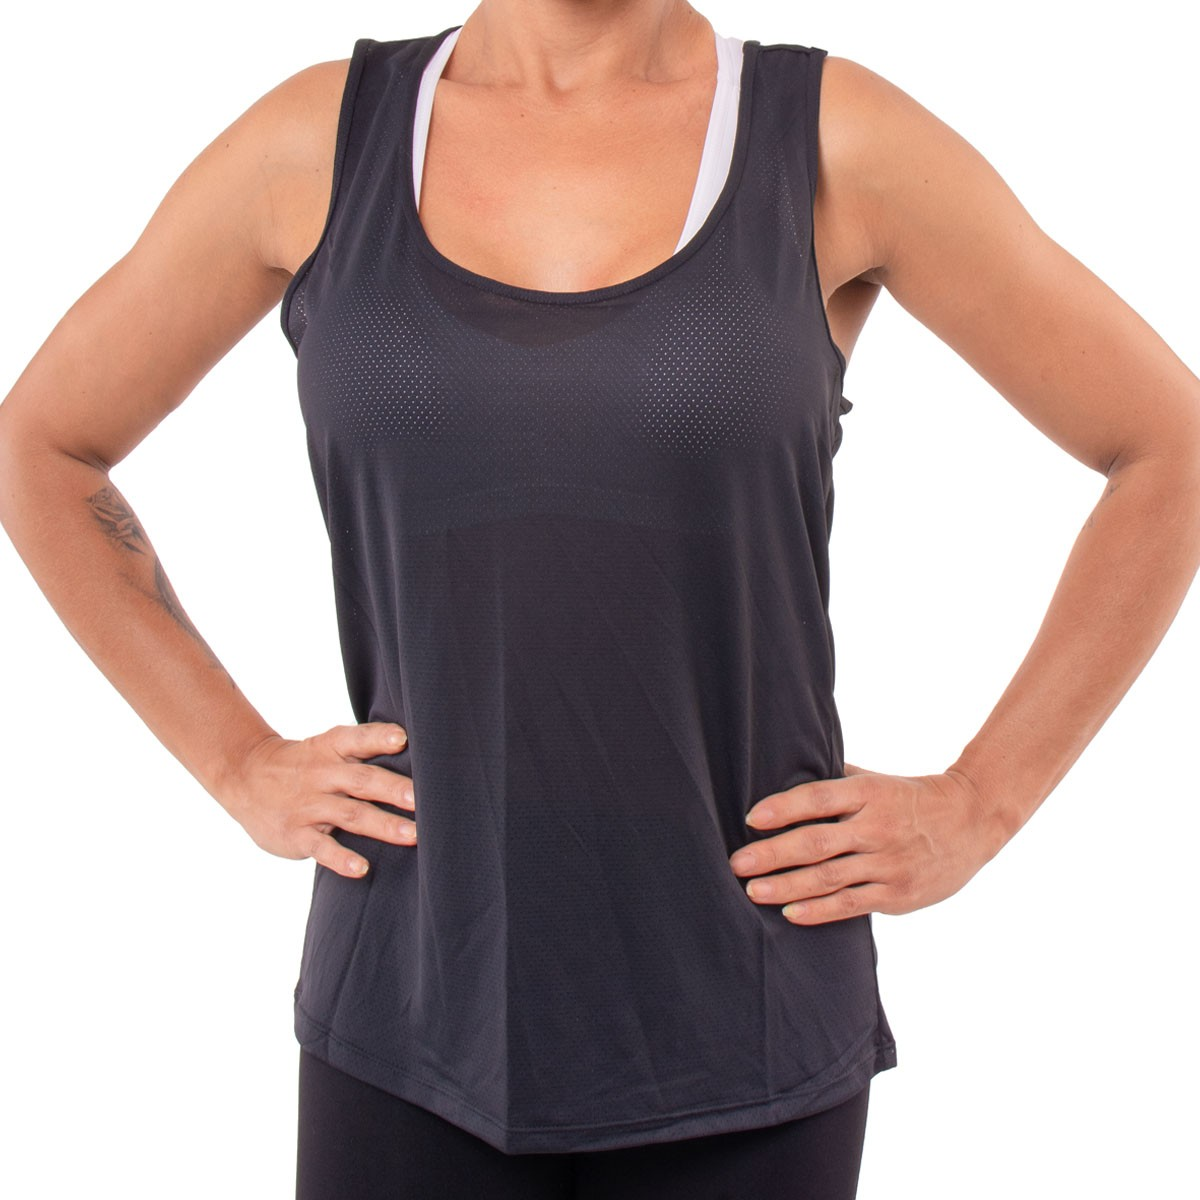 Regata feminina nadador fitness Dry fit Selene